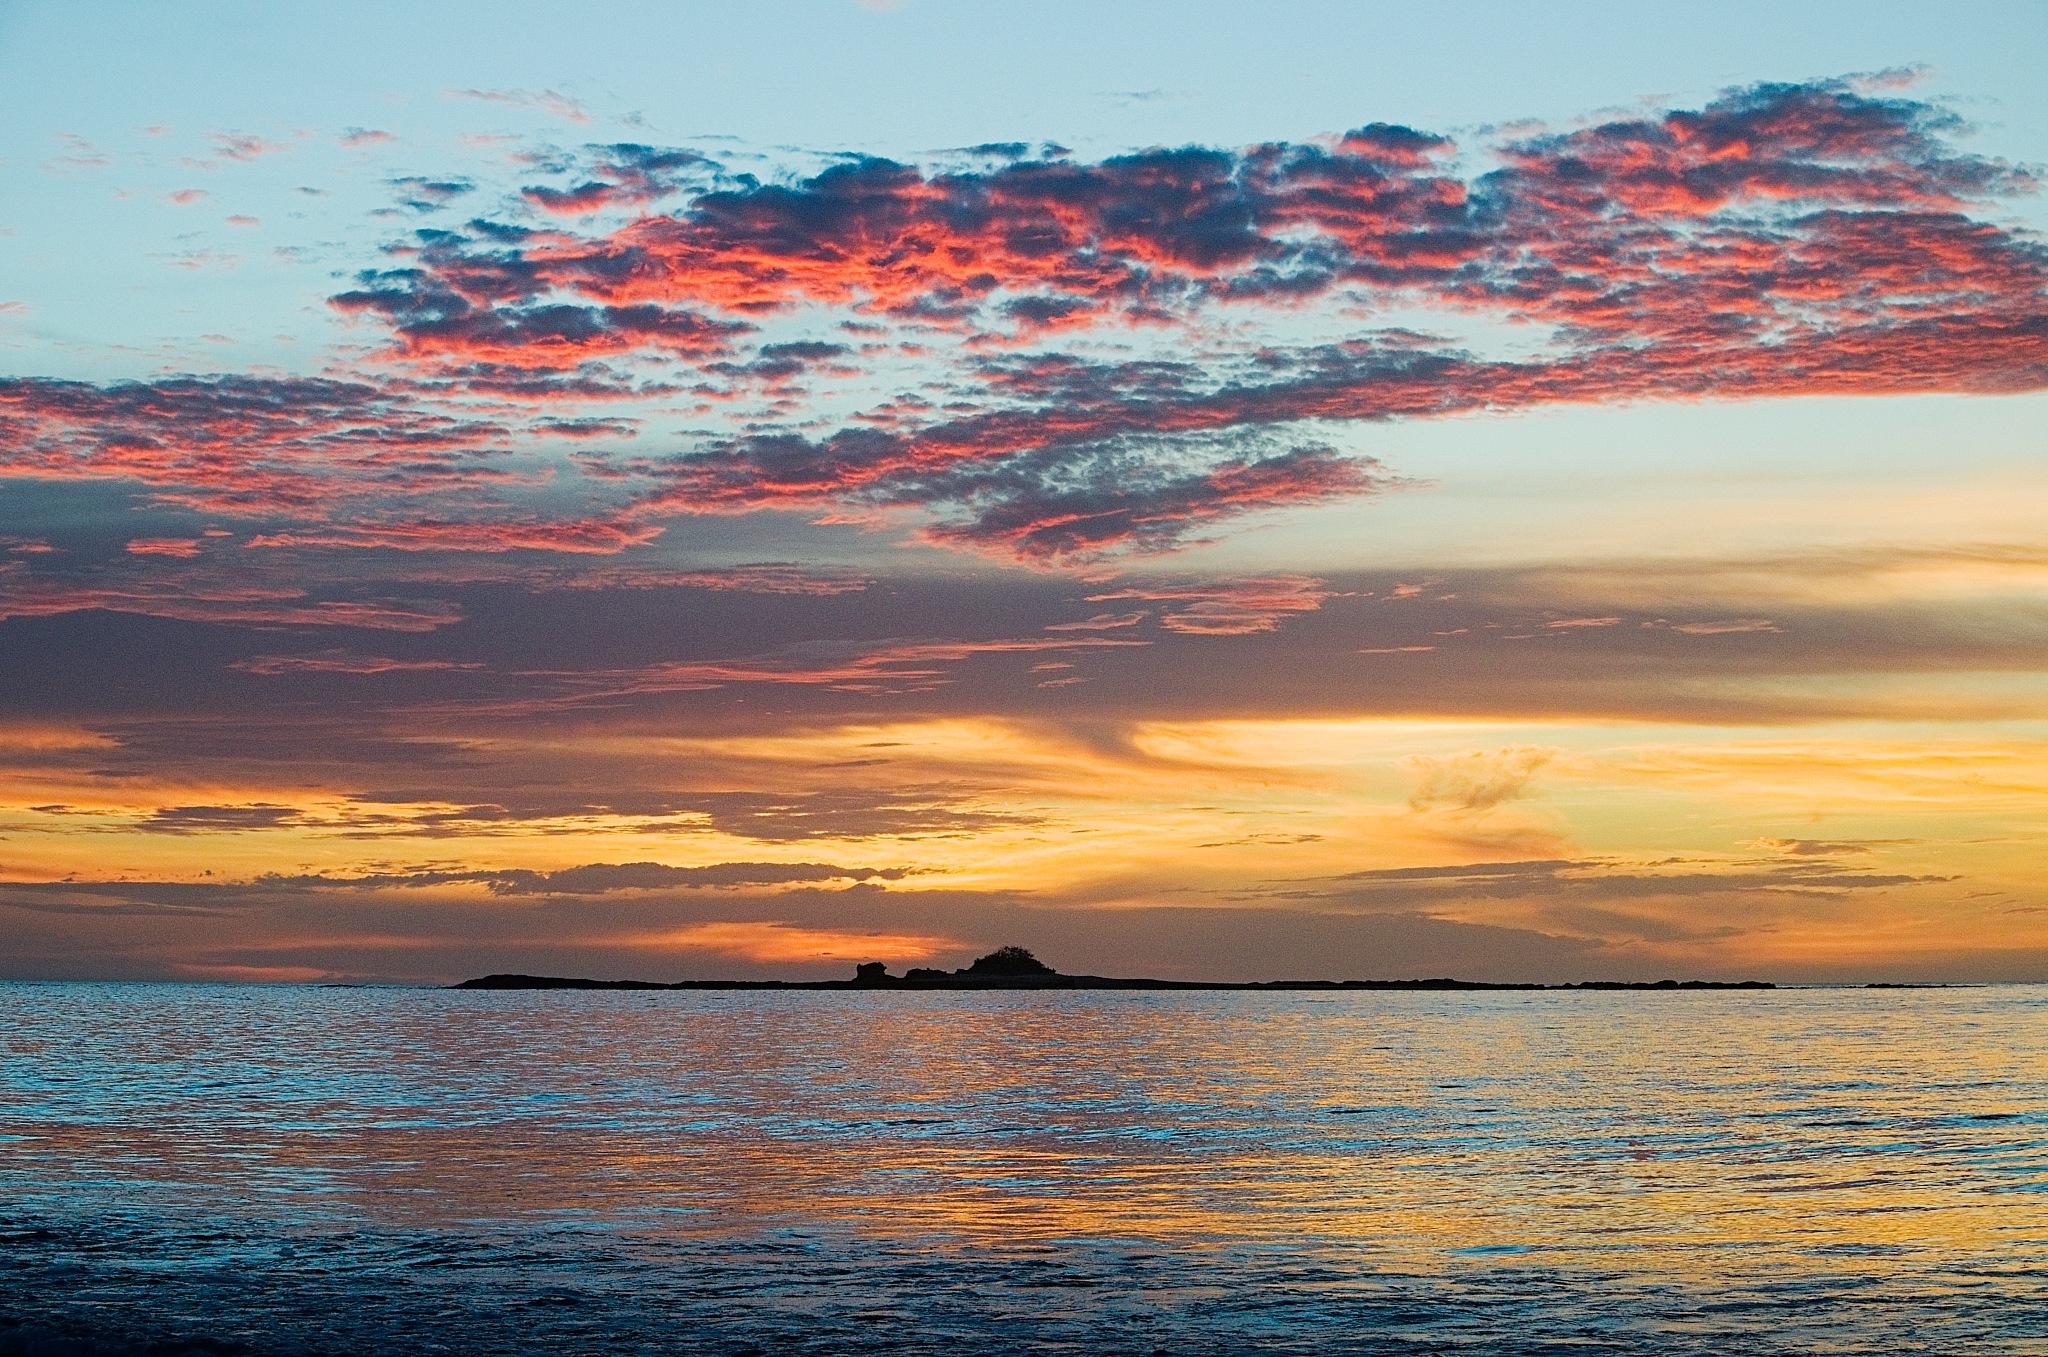 Sunset Pink, Red & Orange Sky by Smilin' Dog